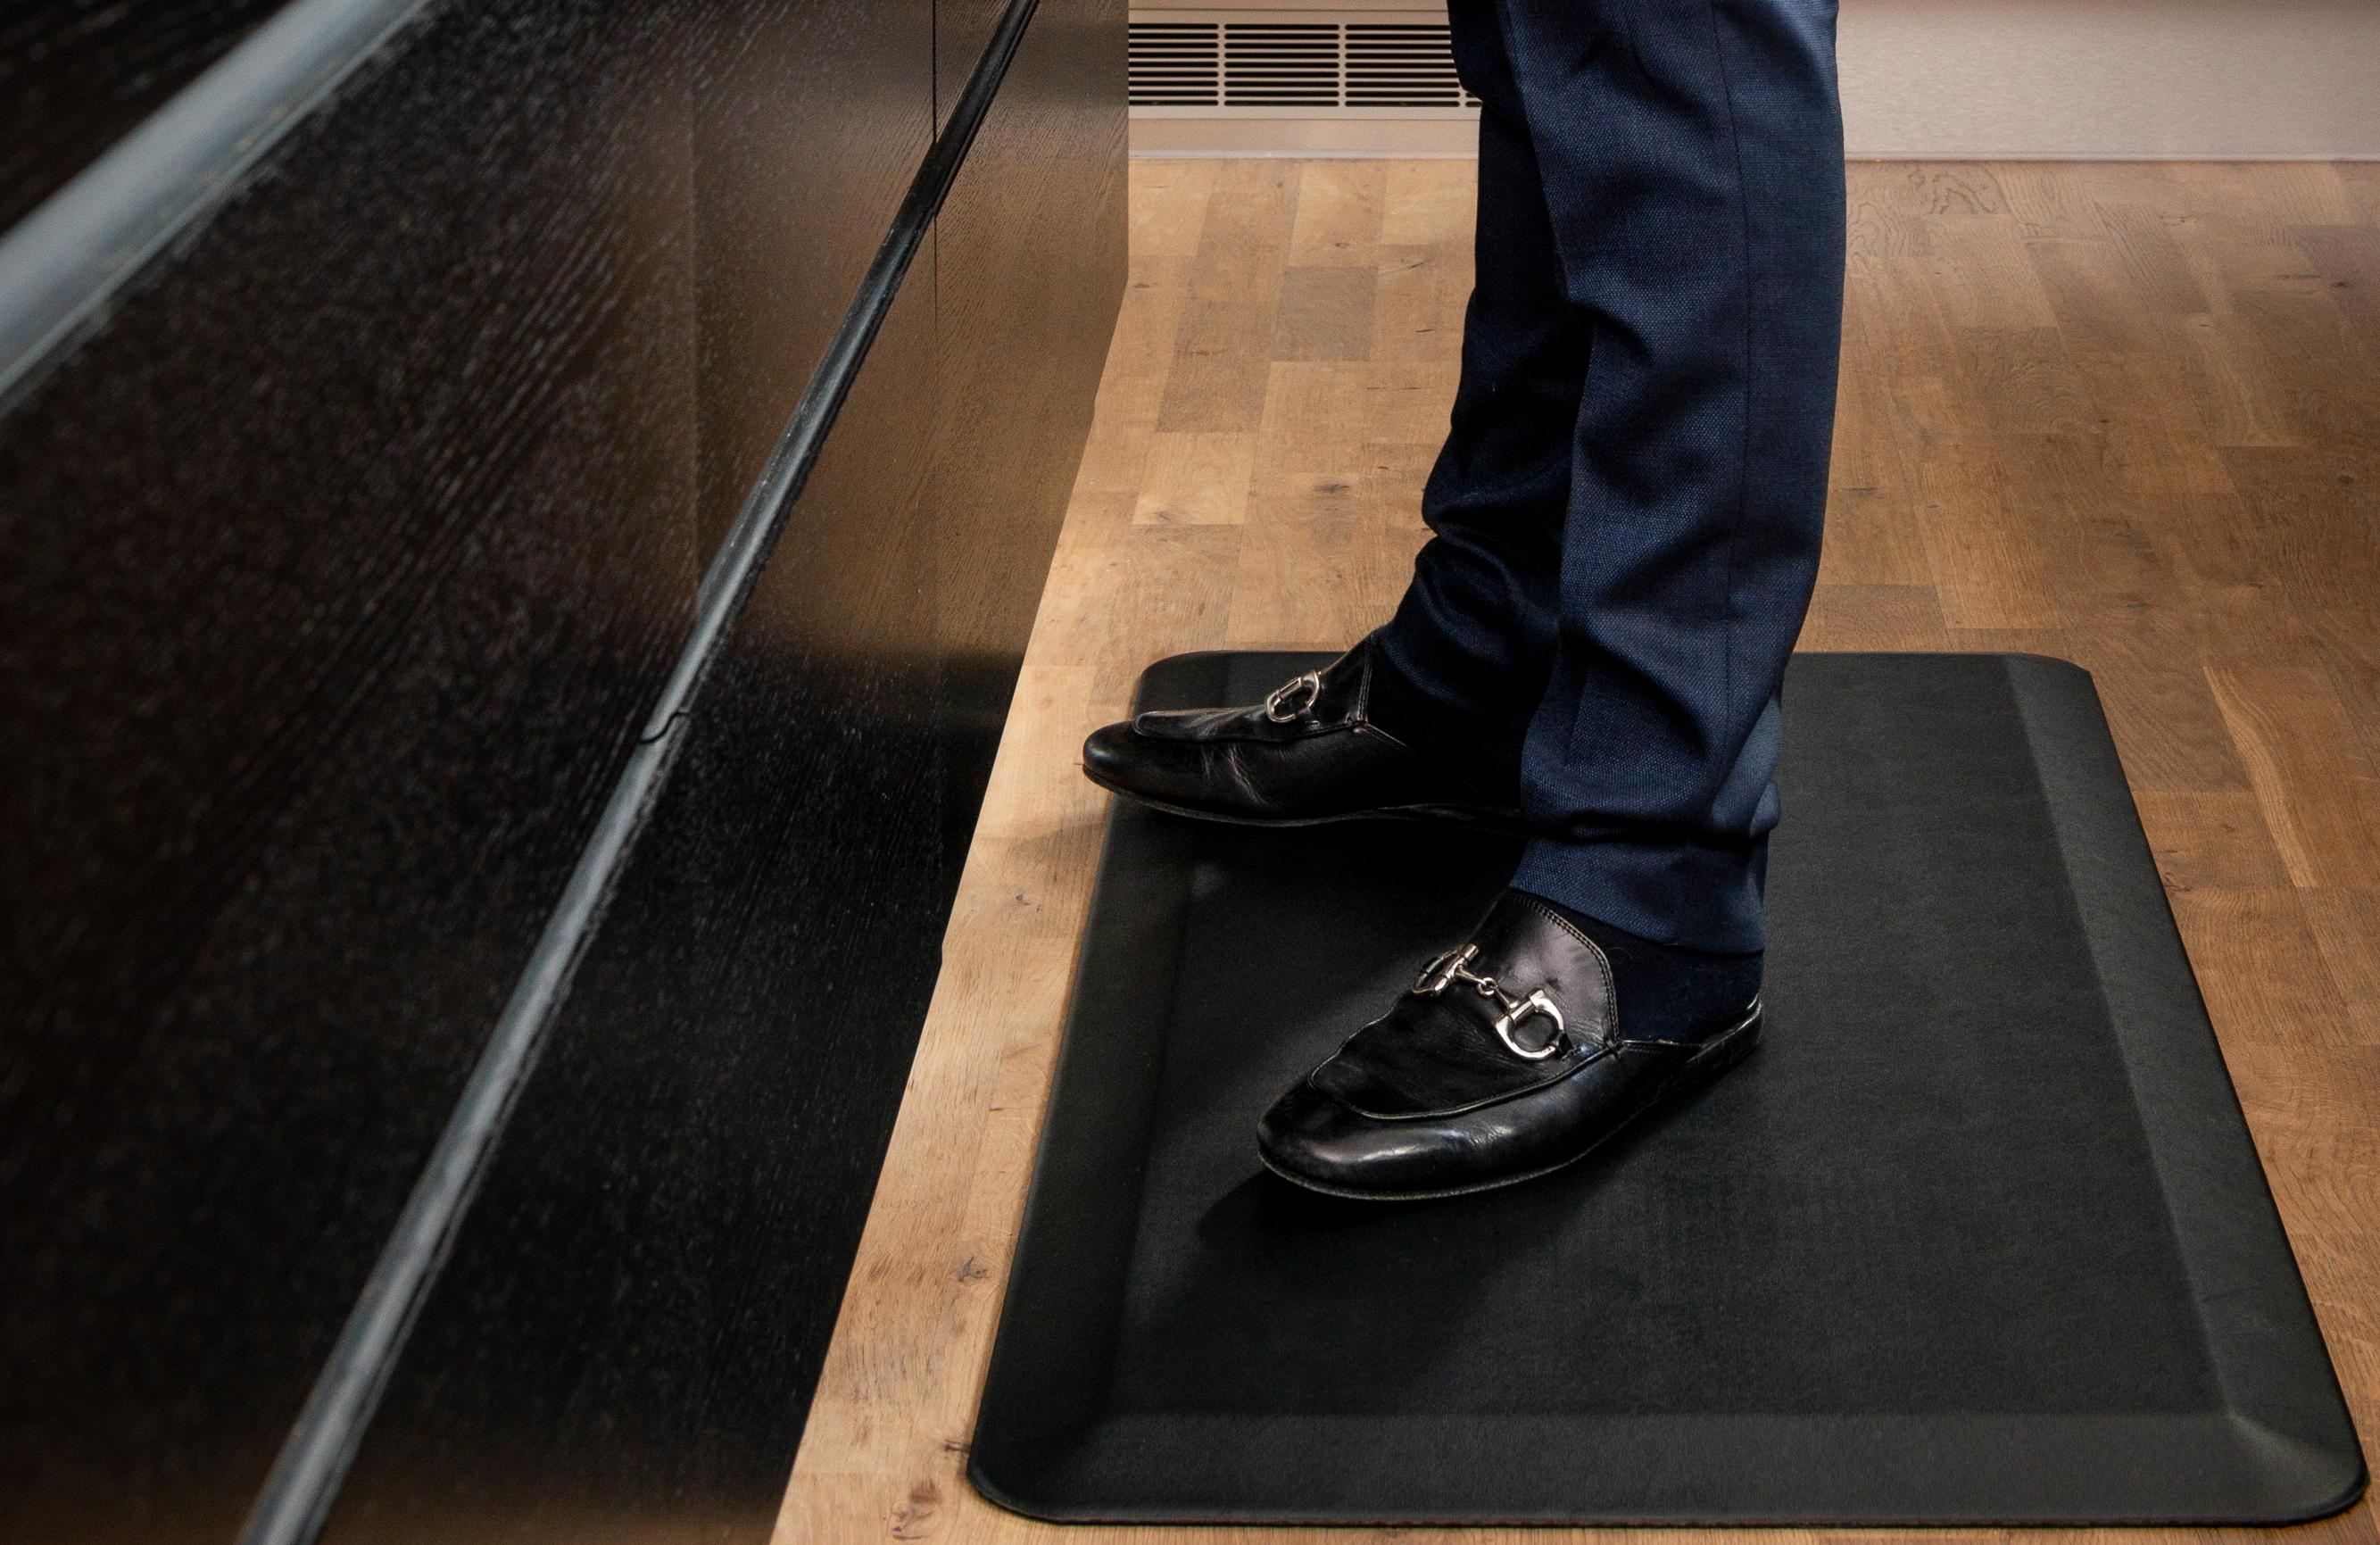 Home-Step Ergonomiskmatta i Polyuretan svart 51x121cm